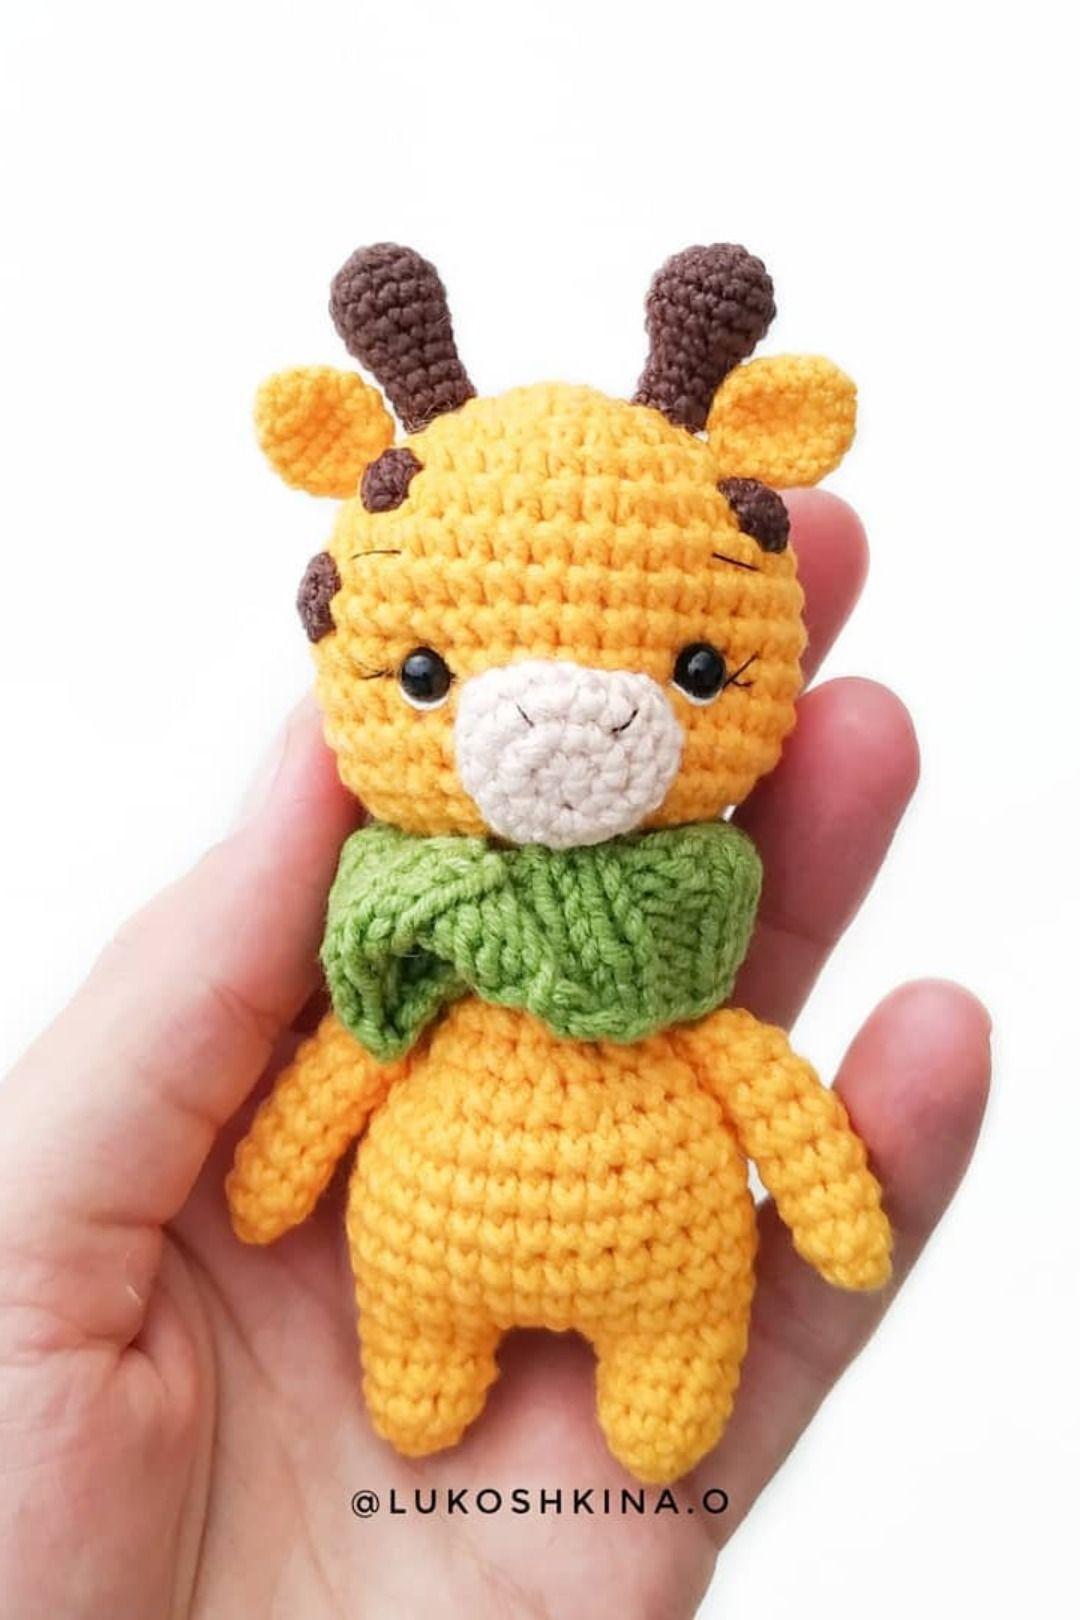 Hearty Giraffe amigurumi pattern - Amigurumi Today | 1620x1080